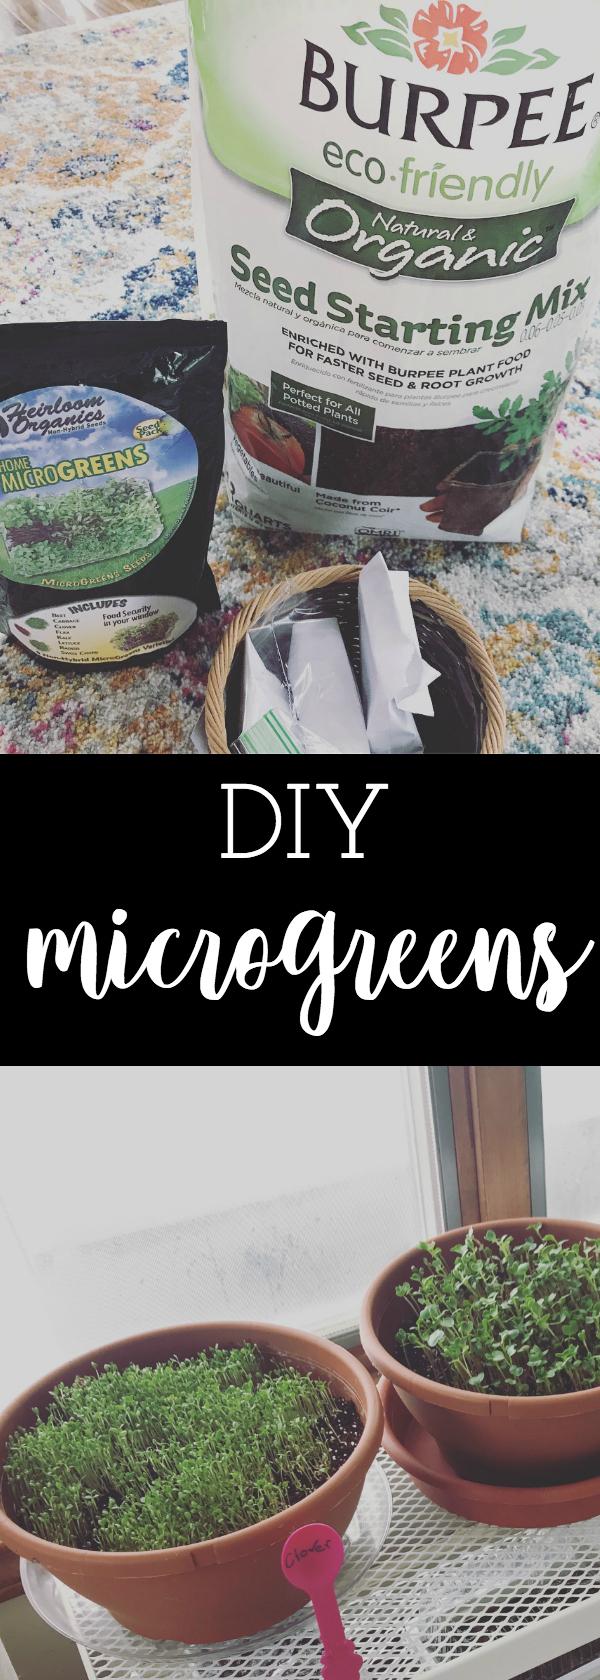 diy microgreens